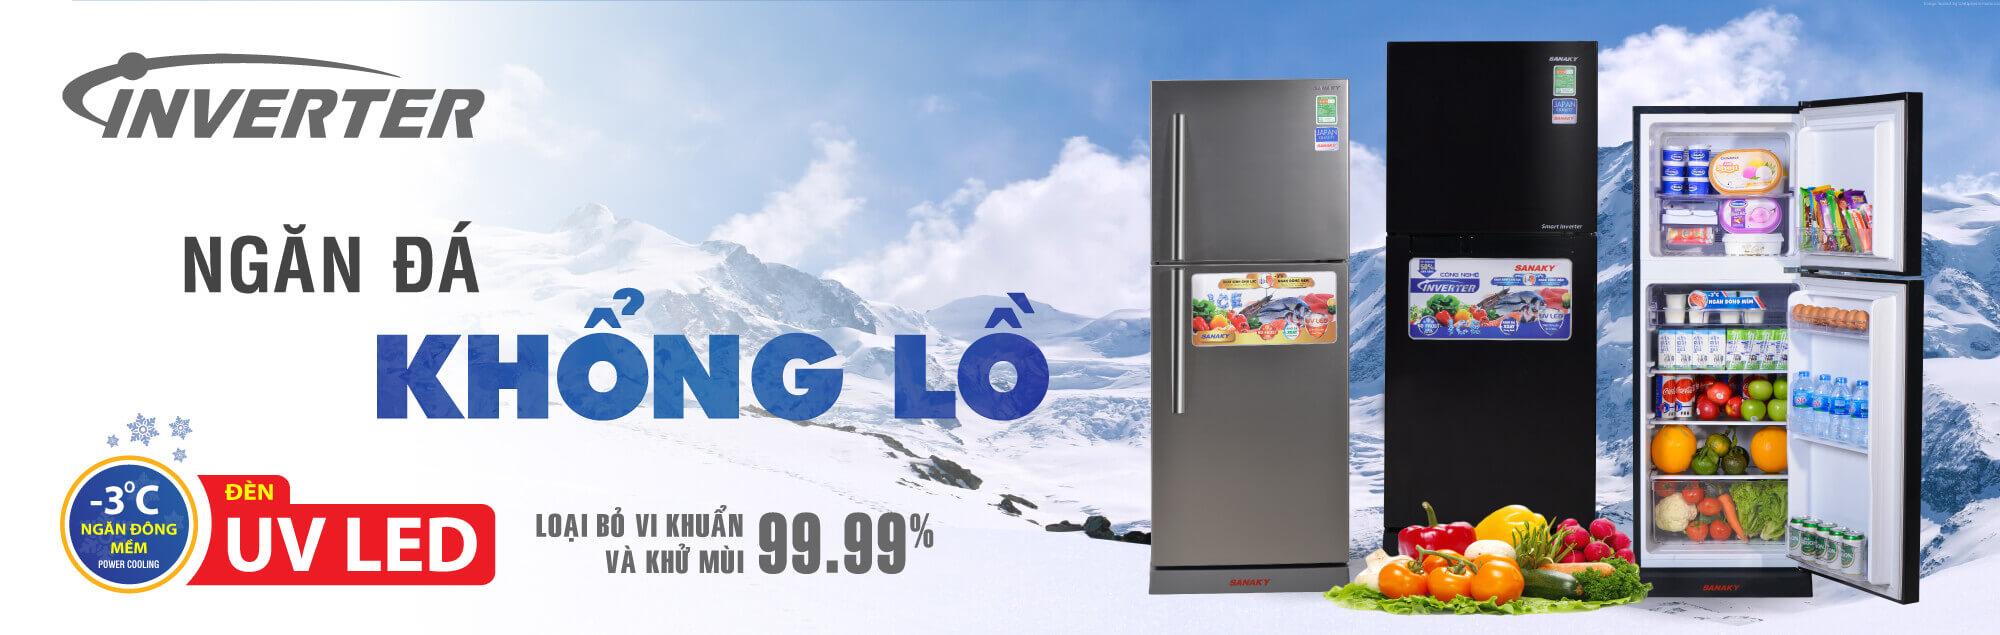 Banner tủ lạnh sanaky 2021